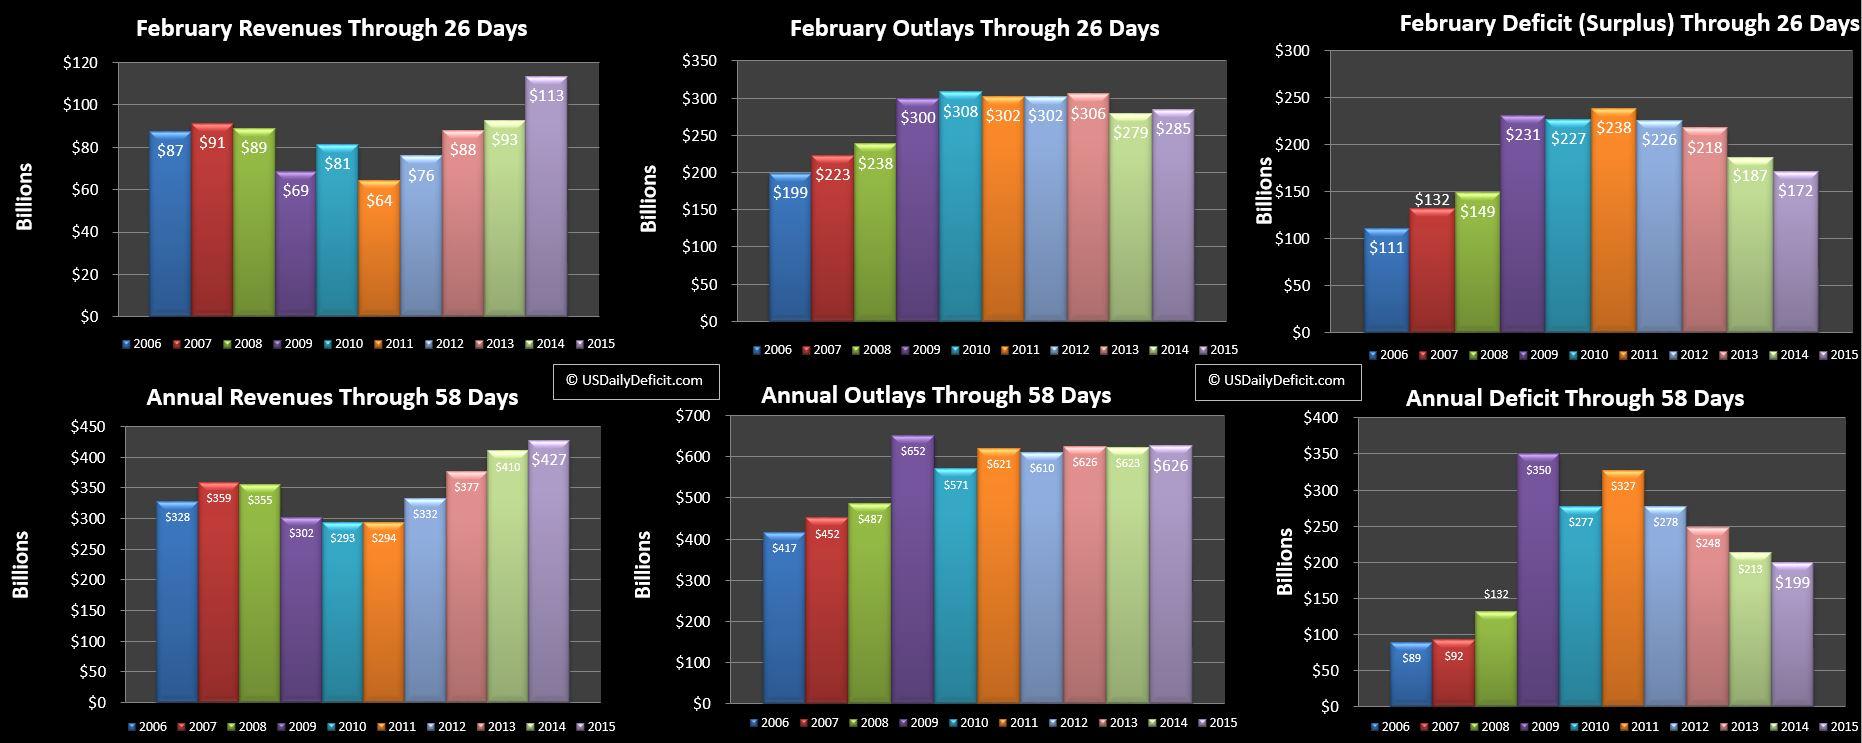 2015-02-26 USDD